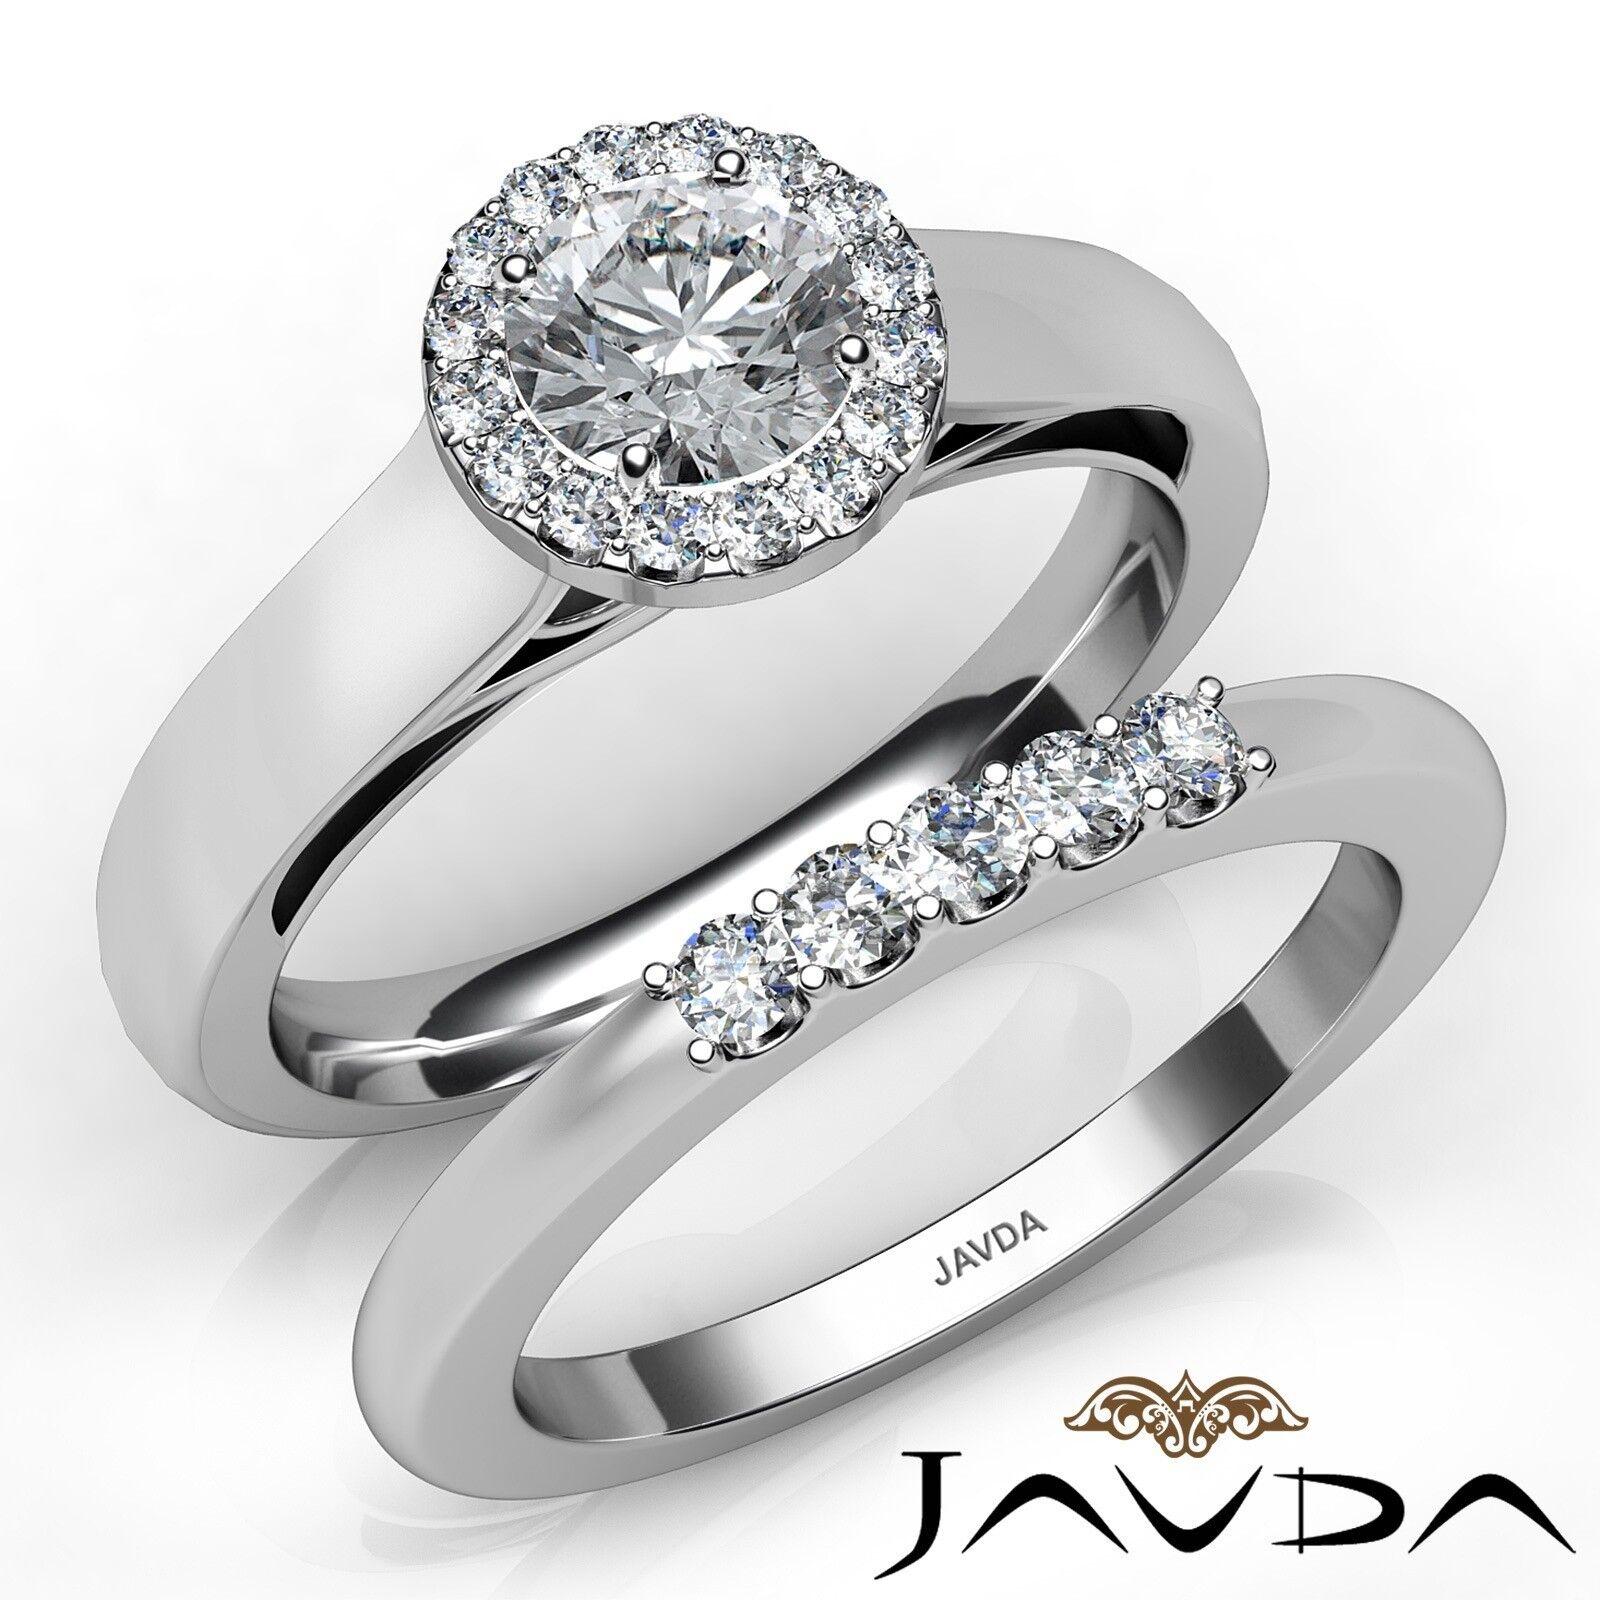 0.8ctw U Prong Halo Bridal Round Diamond Engagement Ring GIA G-VS2 White Gold